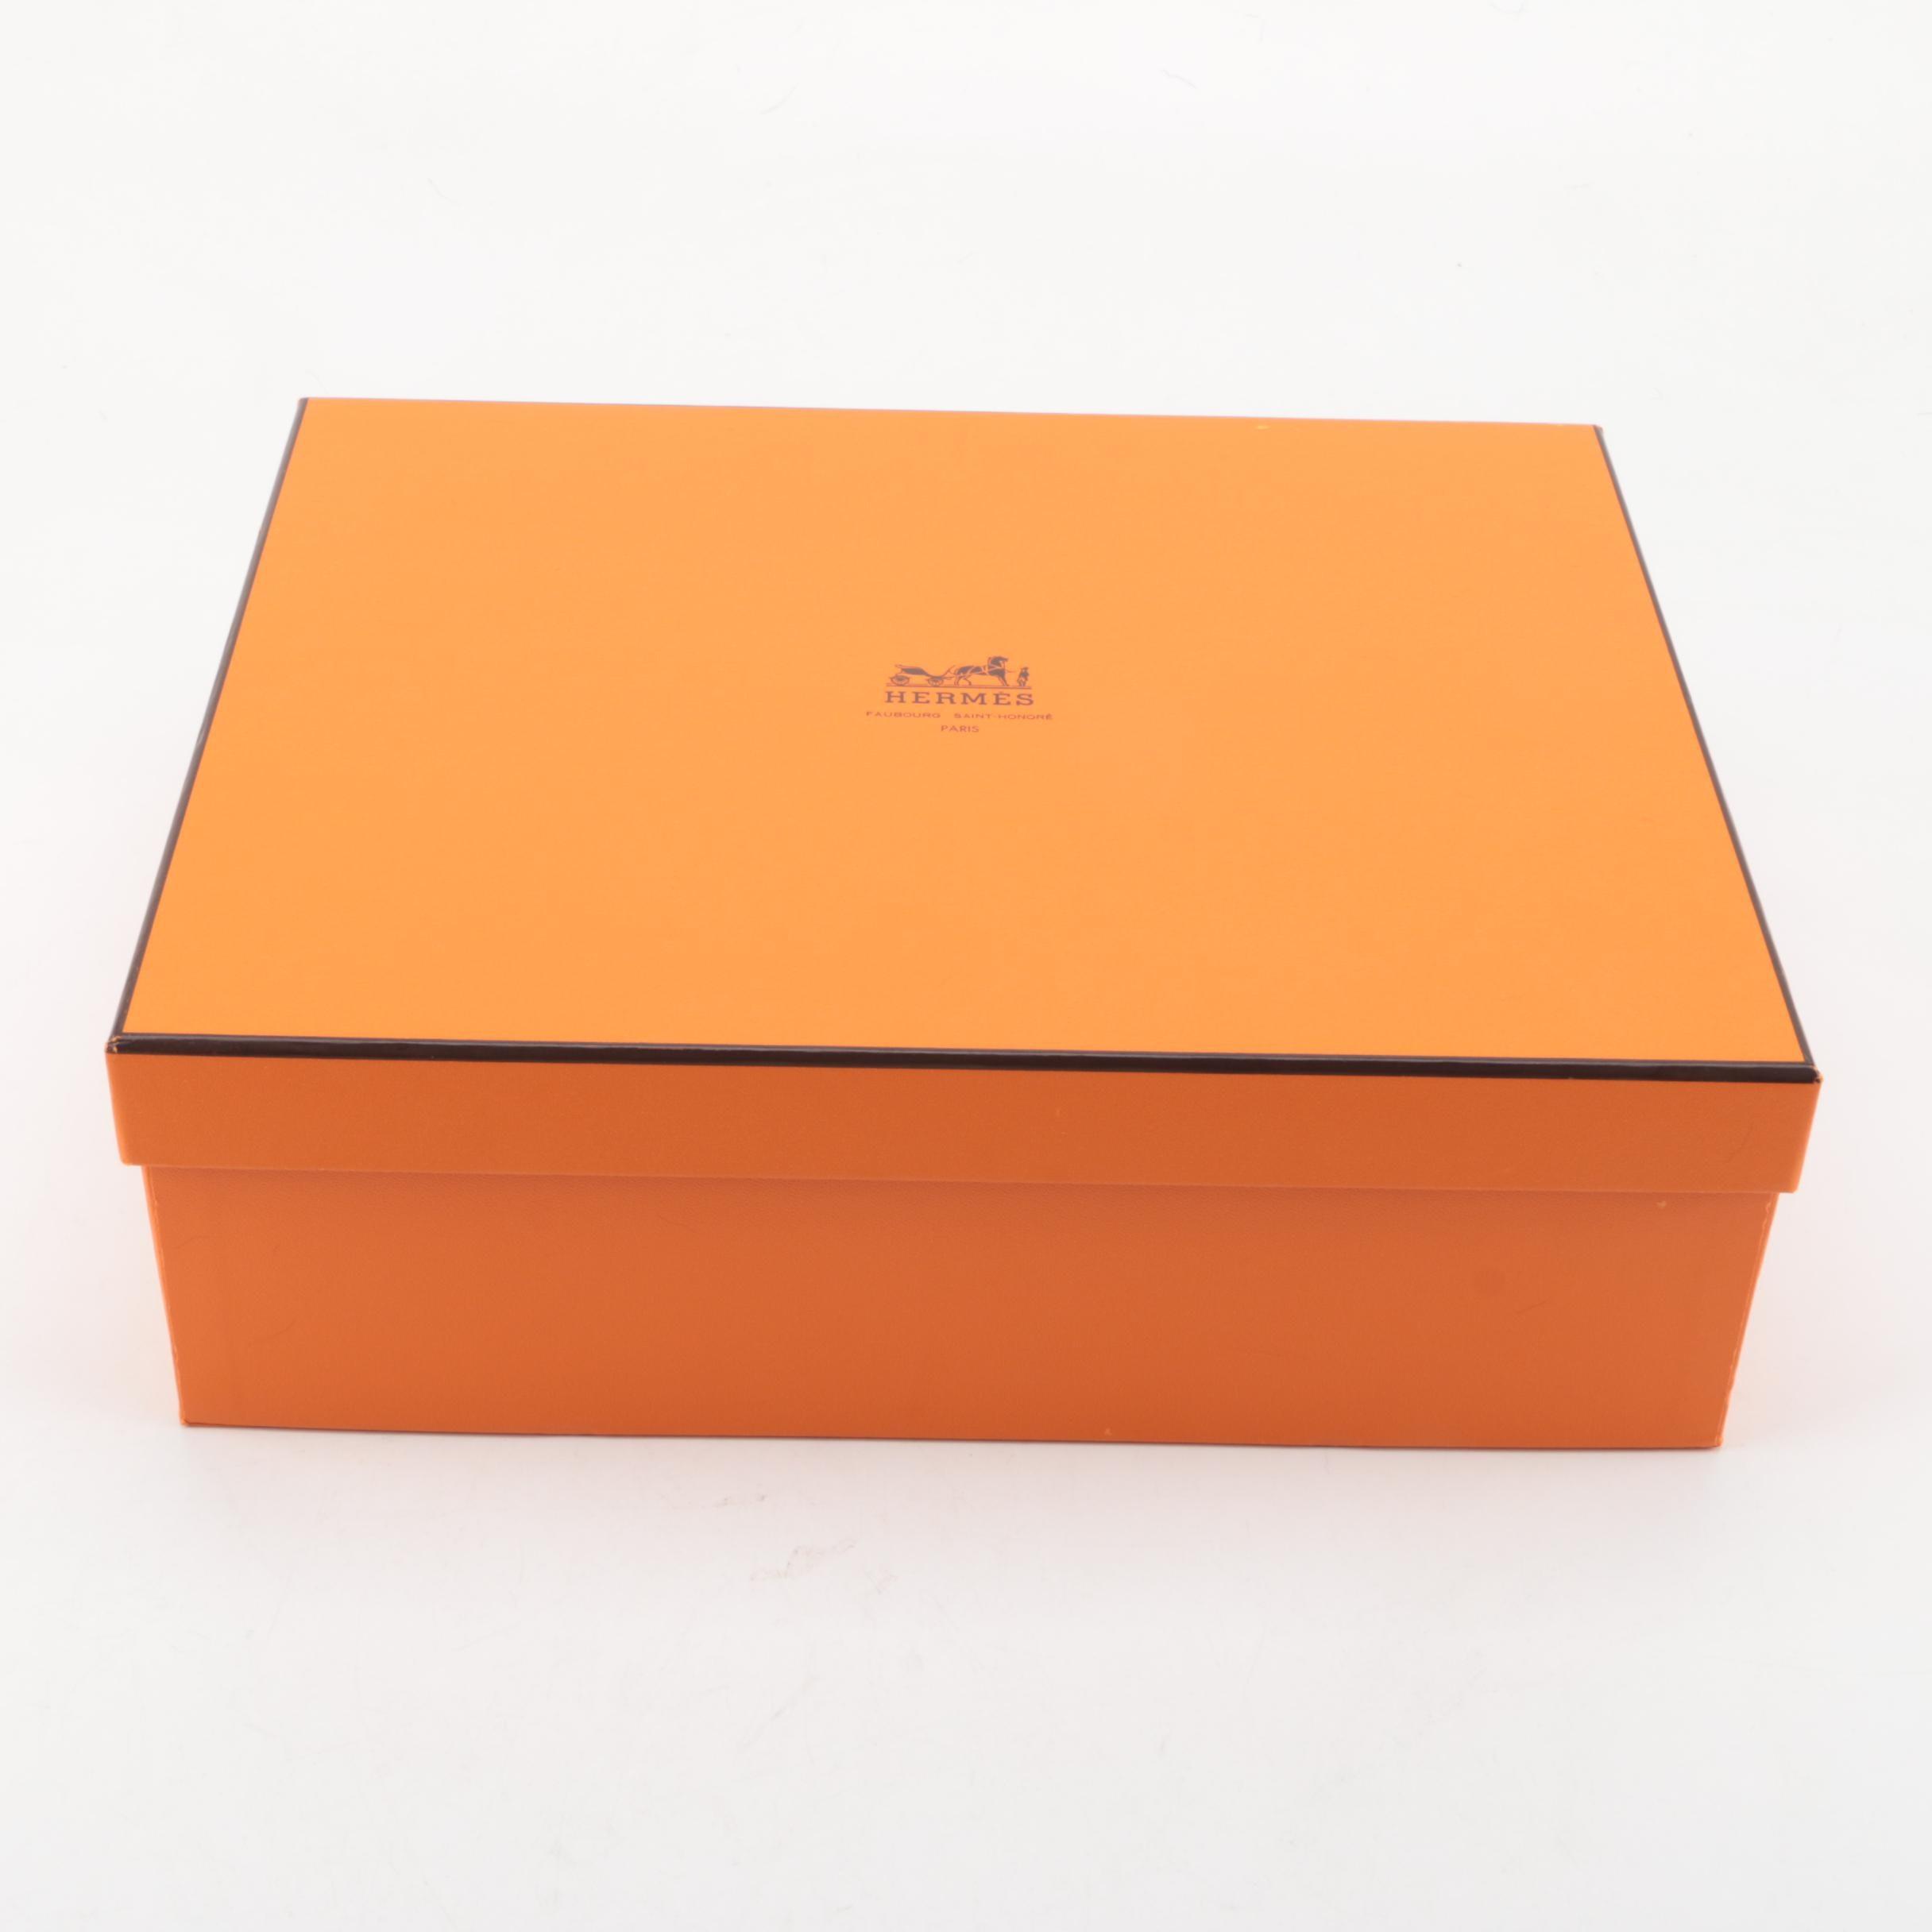 Hermès Paris Gift Box